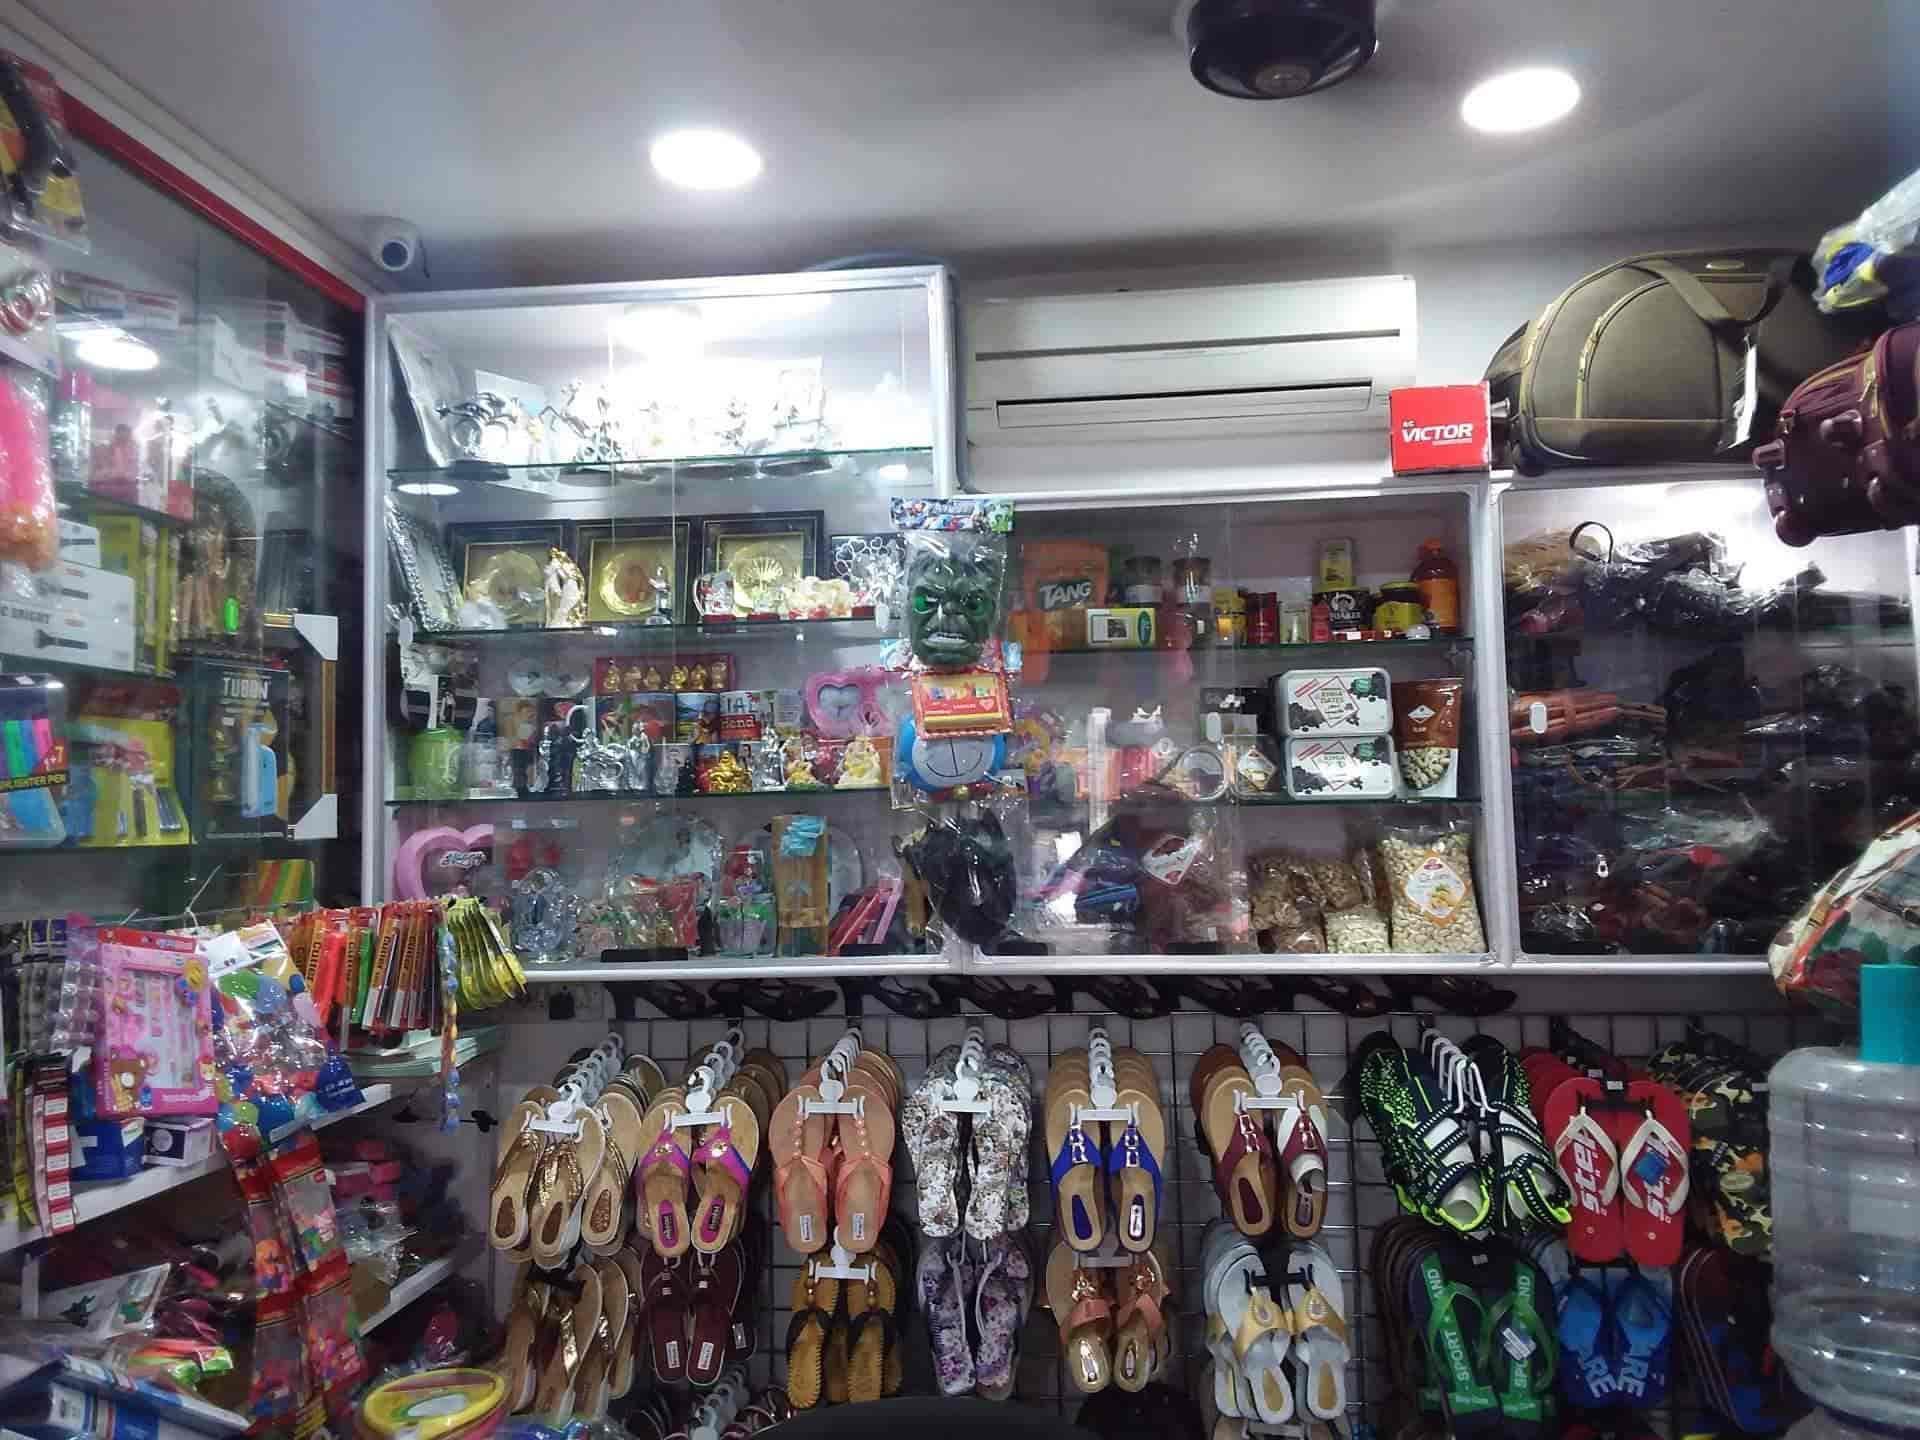 Al Mathina Shopping Center, Palayamkottai - Gift Shops in Tirunelveli - Justdial